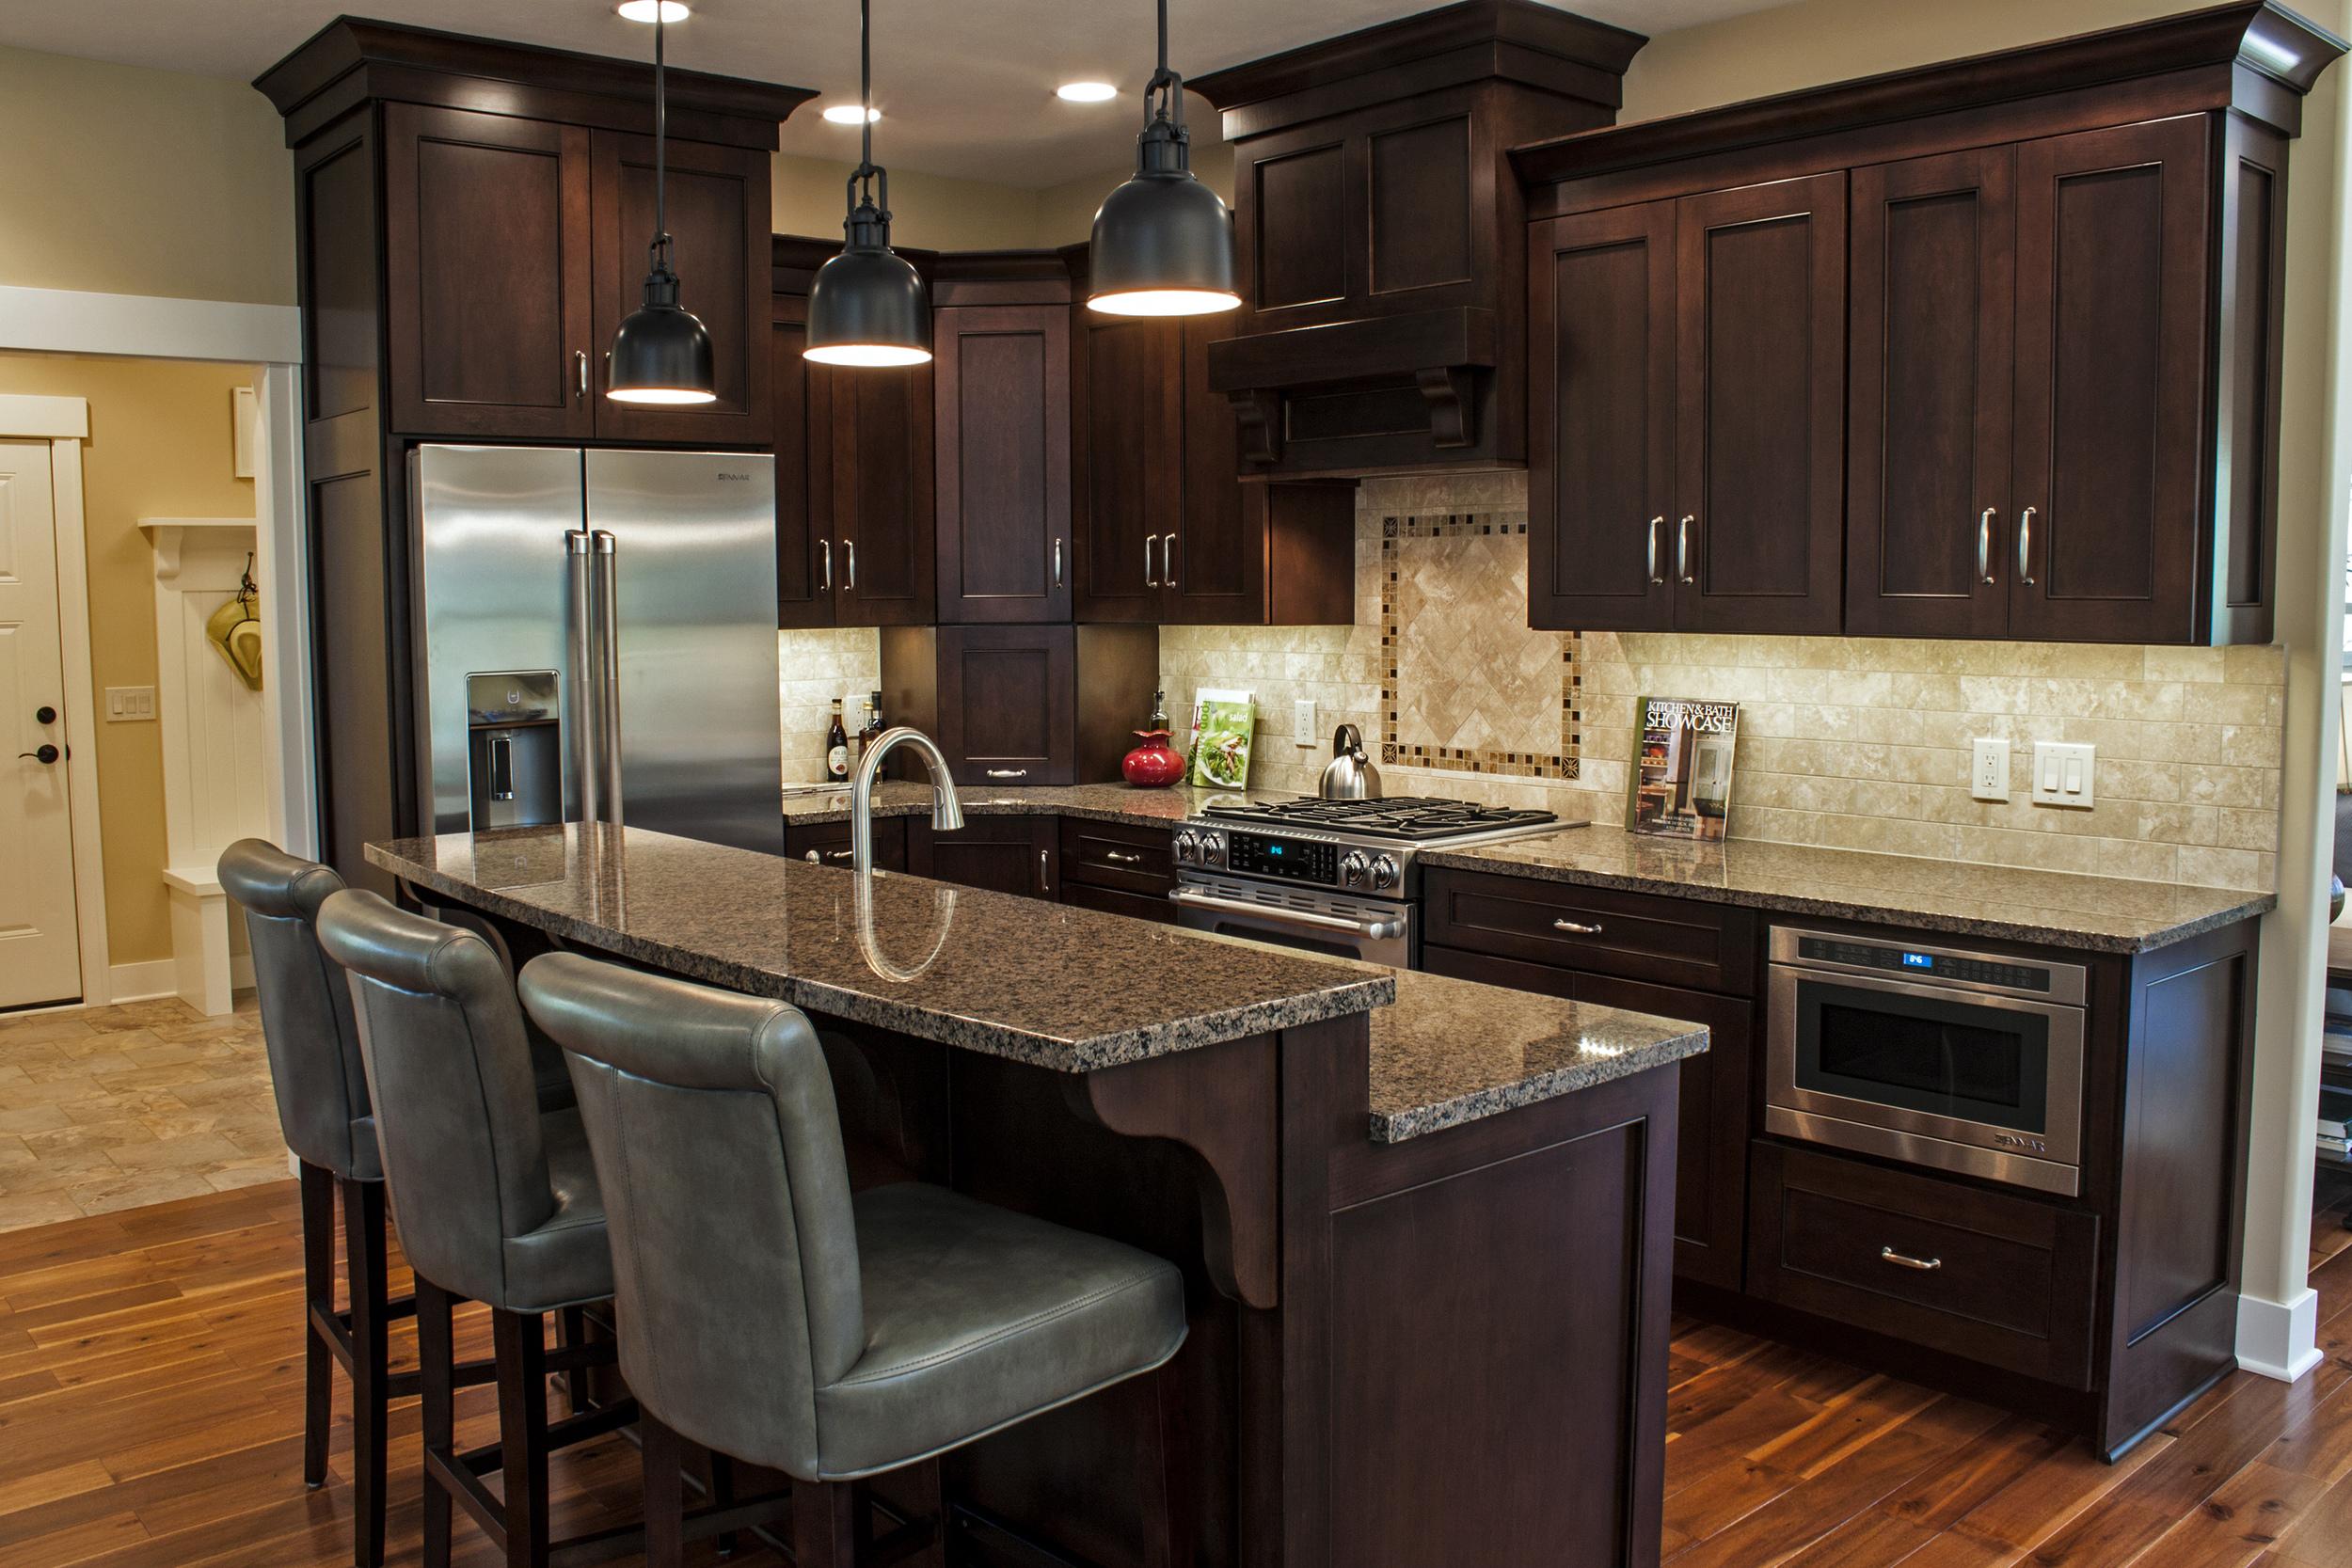 kitchen4-horiz.jpg